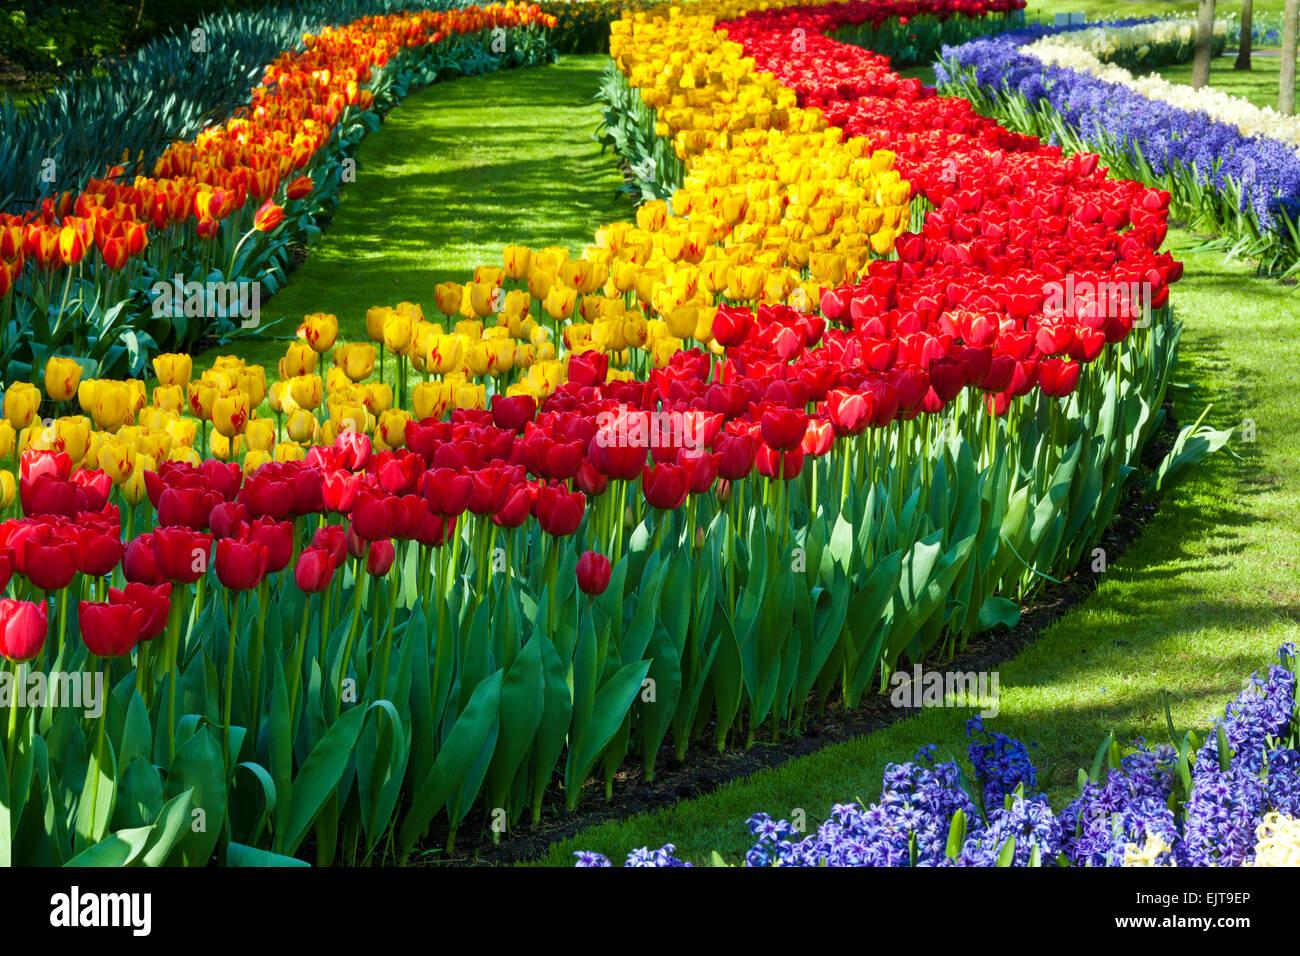 Tulips in Keukenhof Gardens, Netherlands - Stock Image